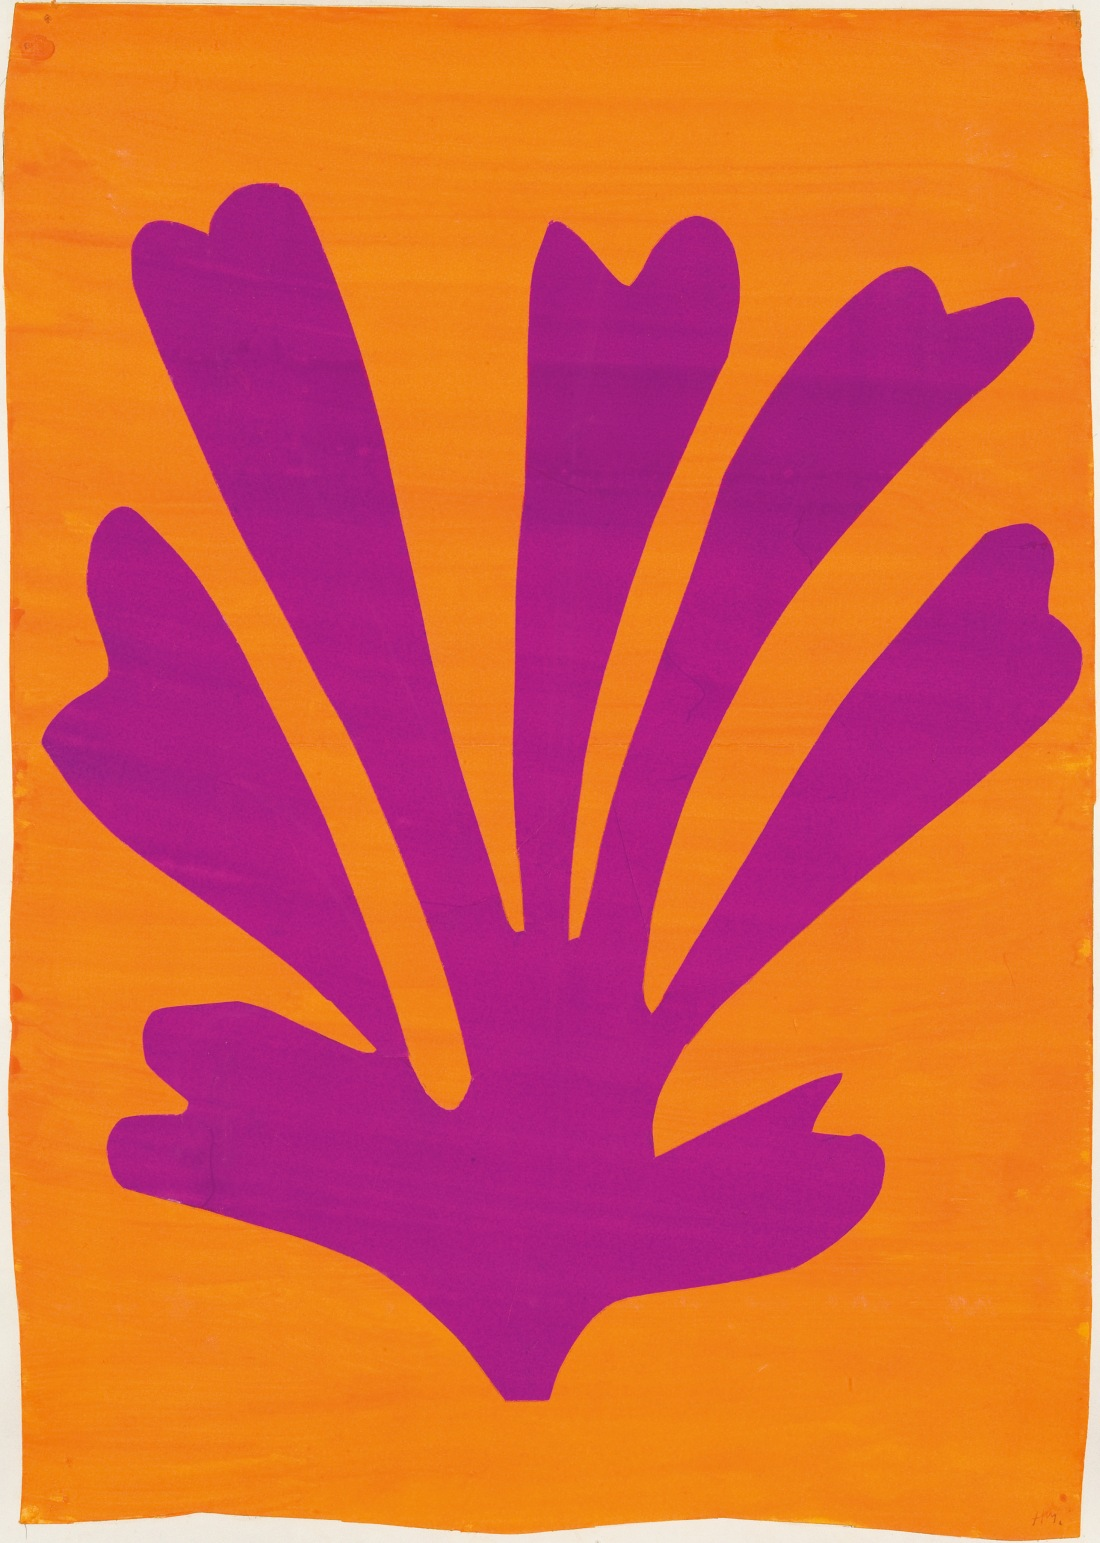 Henri Matisse,  Palmette (Feuille violet sur fond orange), 1947.